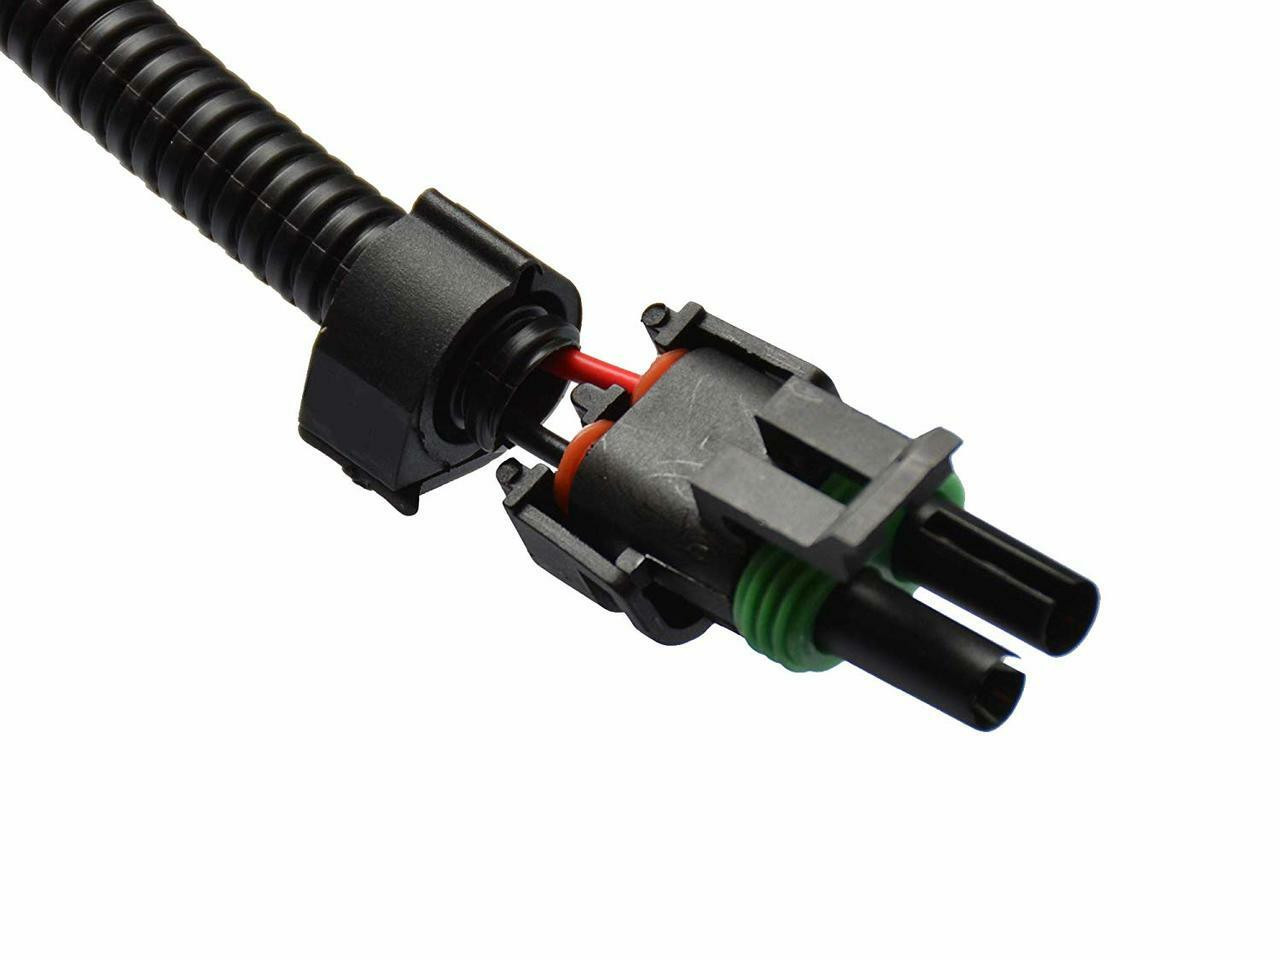 medium resolution of tpi tbi intake air temp sensor wiring harness iat l98 tuned port injection fits 1986